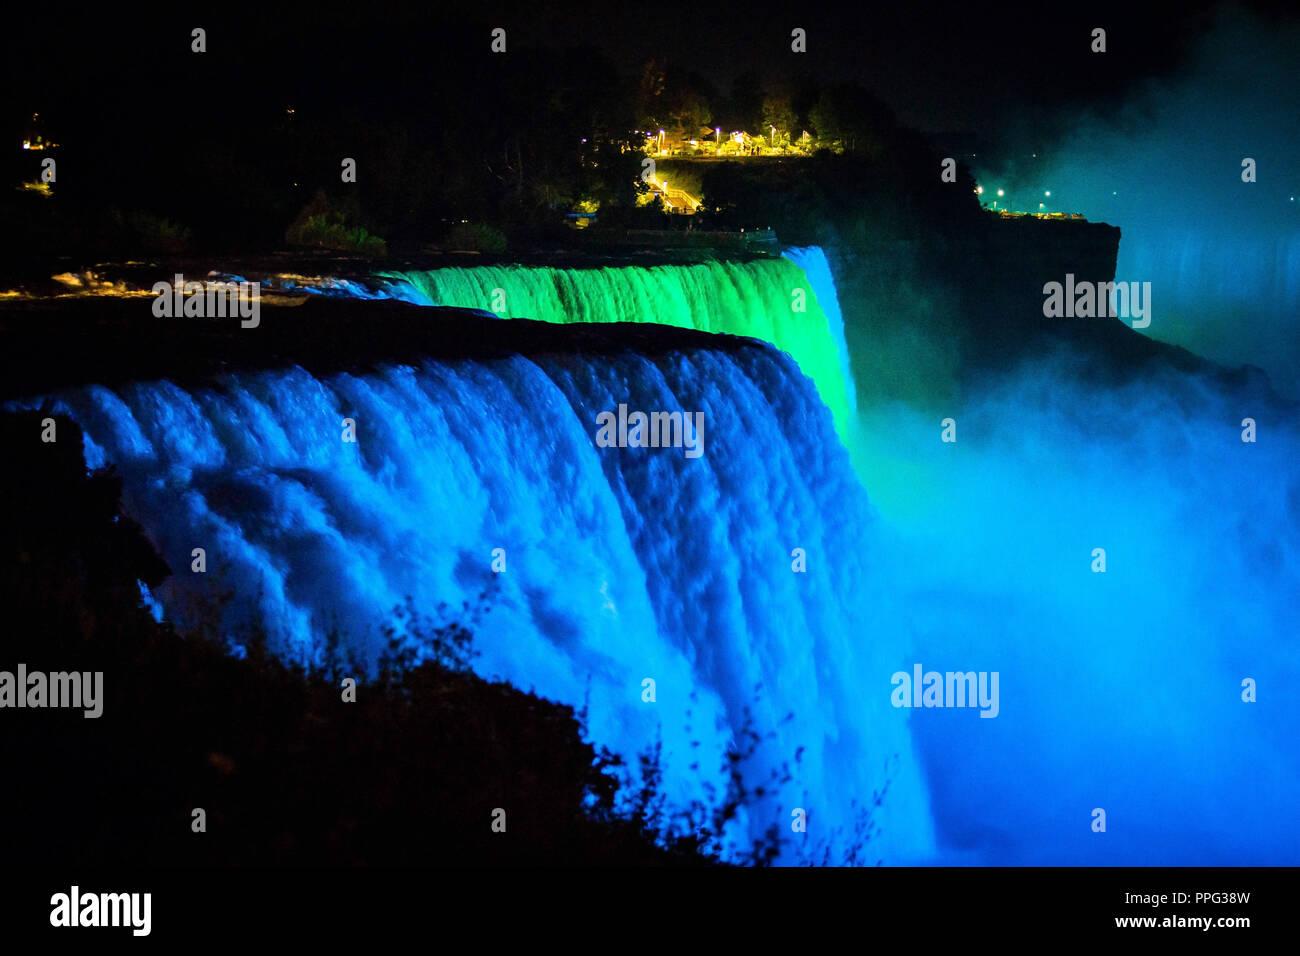 Niagara Falls Illuminated With Color Lights At Night View Stock Photo